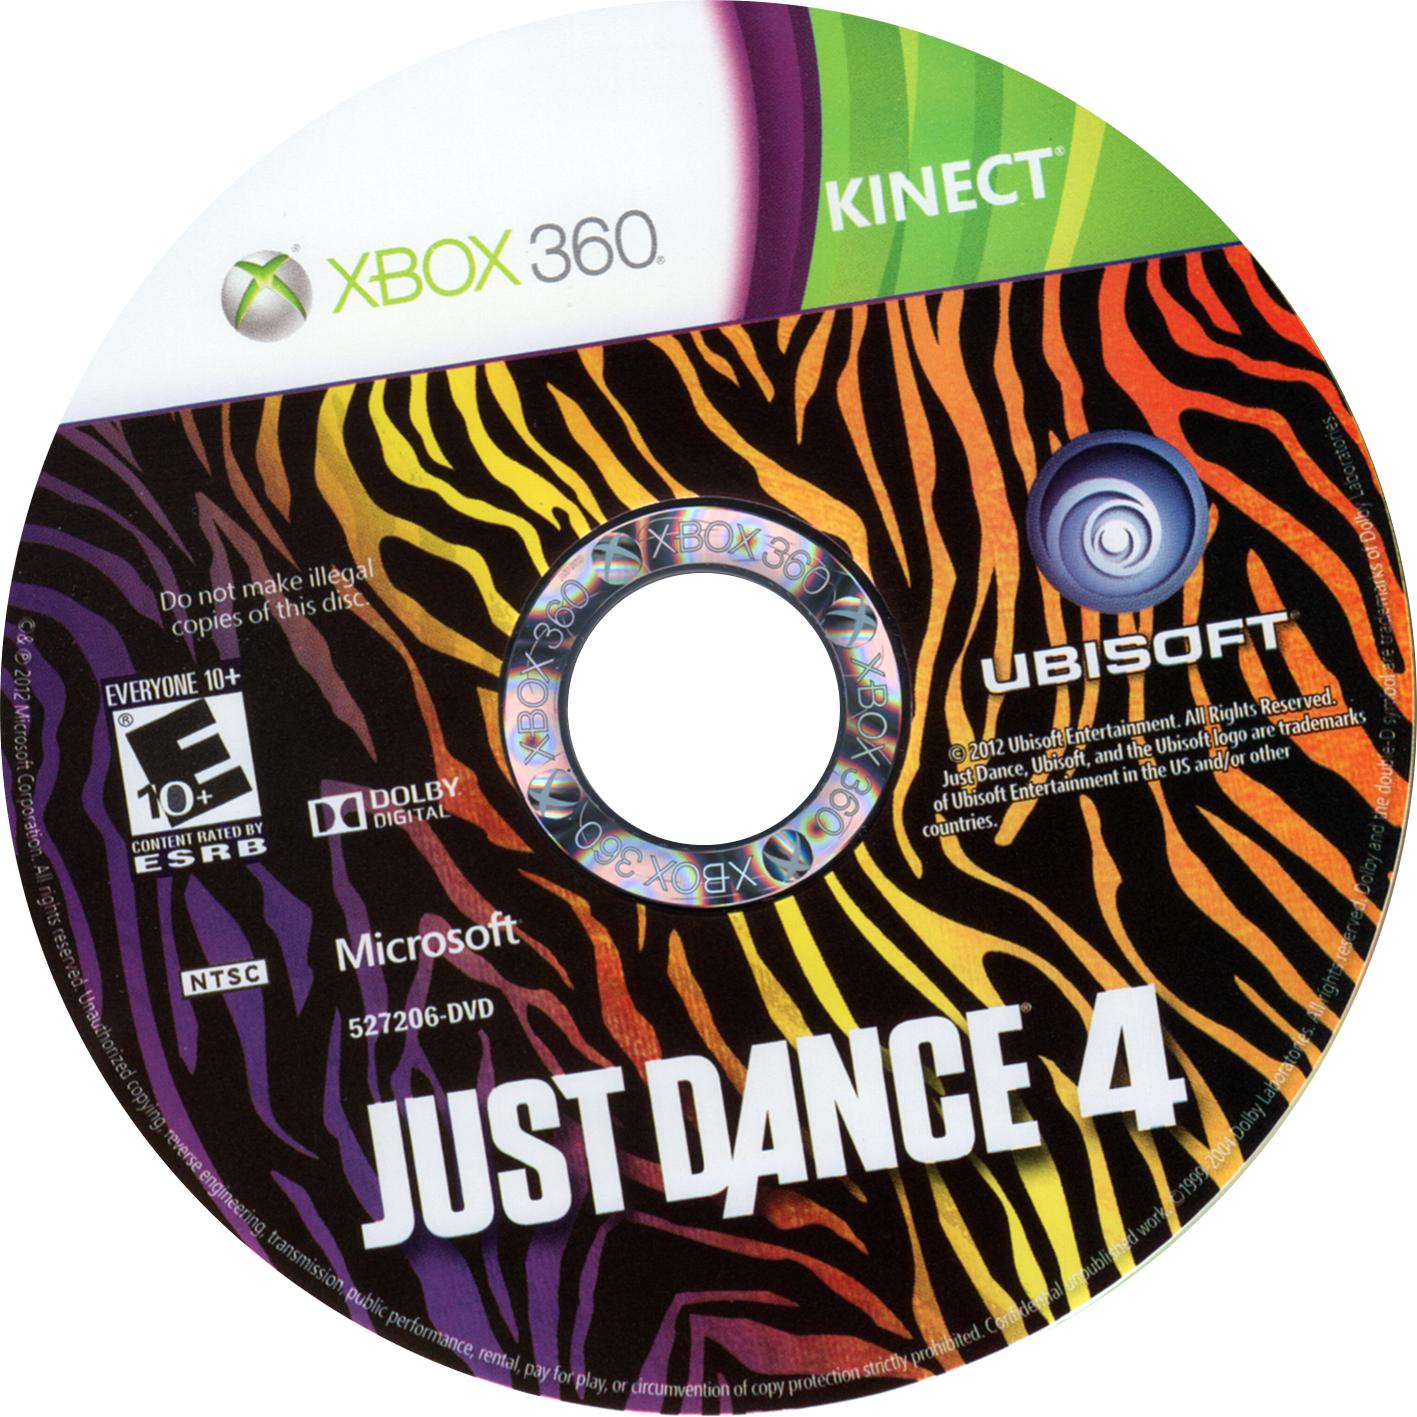 http://4.bp.blogspot.com/-tCkLn3lW3Ag/ULCiFtjEgII/AAAAAAAADNU/PwELXhlqh-w/s1600/Just+Dance+4.jpg